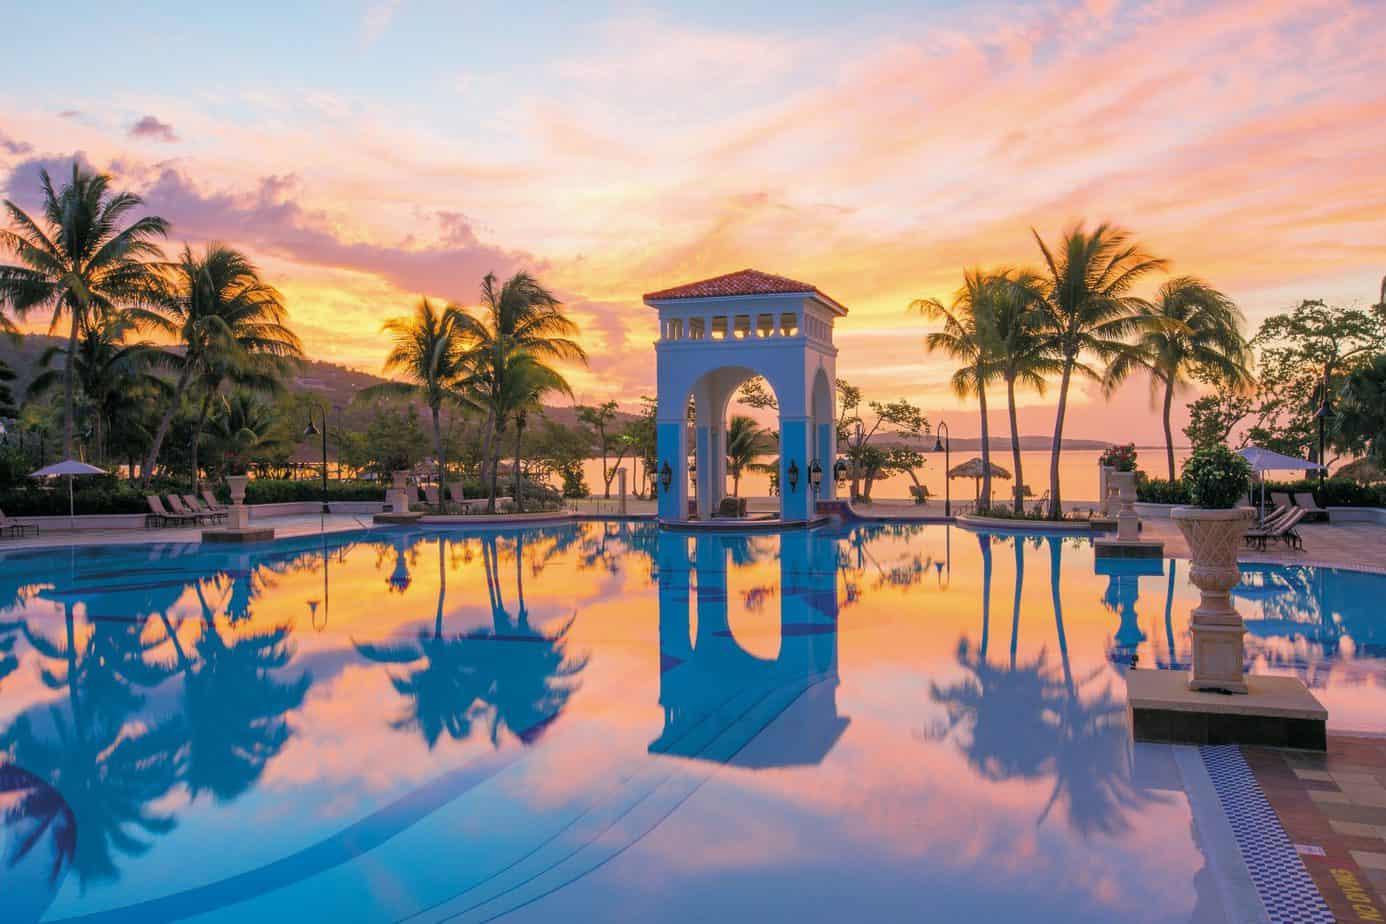 Best Honeymoon Destinations 2020 7 of the Best Caribbean Honeymoon Destinations 2019/2020